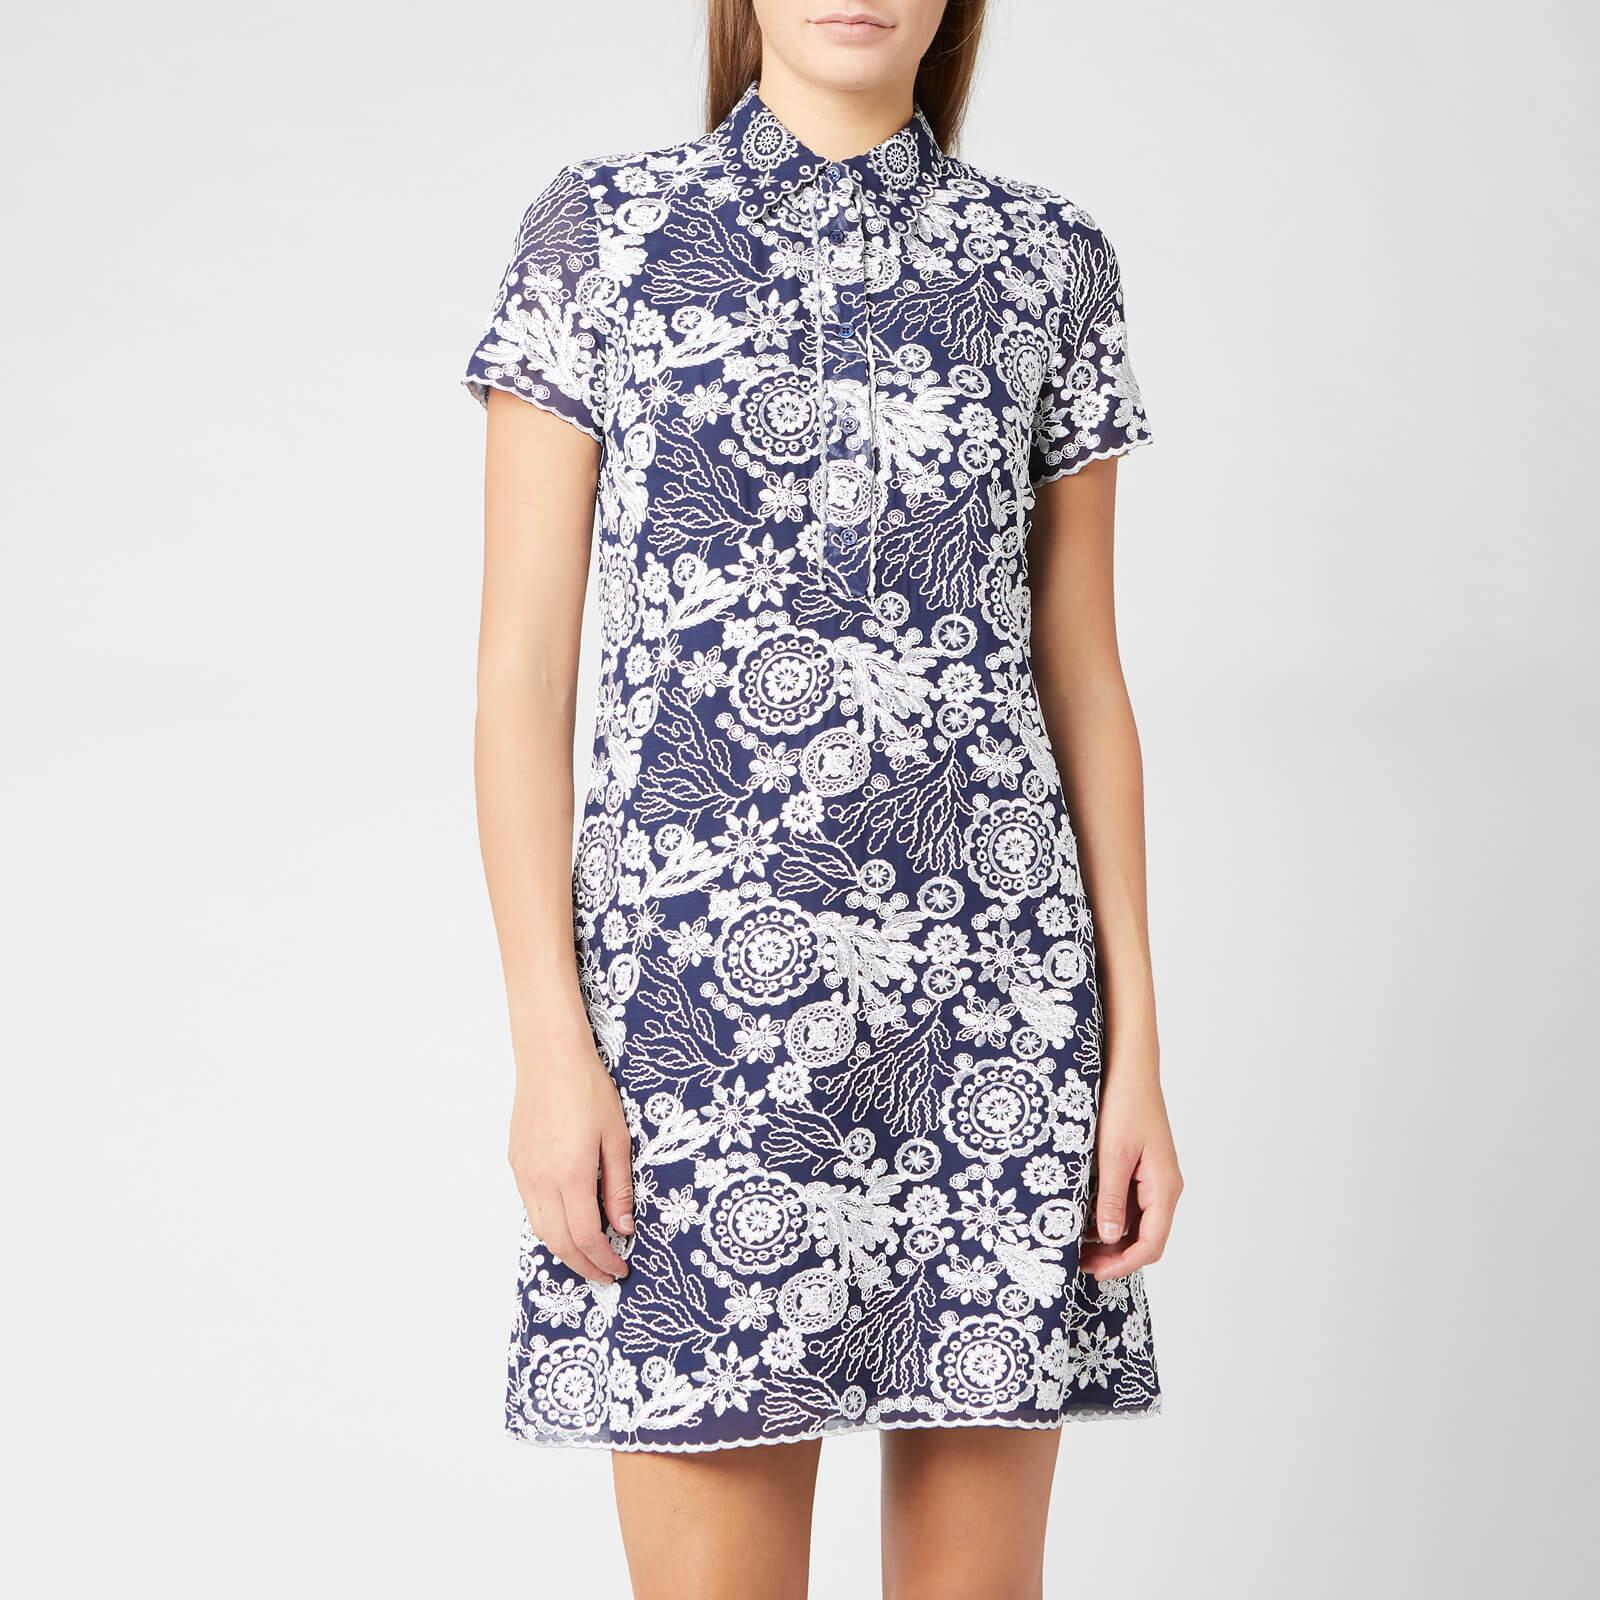 MICHAEL MICHAEL KORS Women's Embroidered T-Shirt Dress - True Navy/White - US 4/UK 8 - Blue